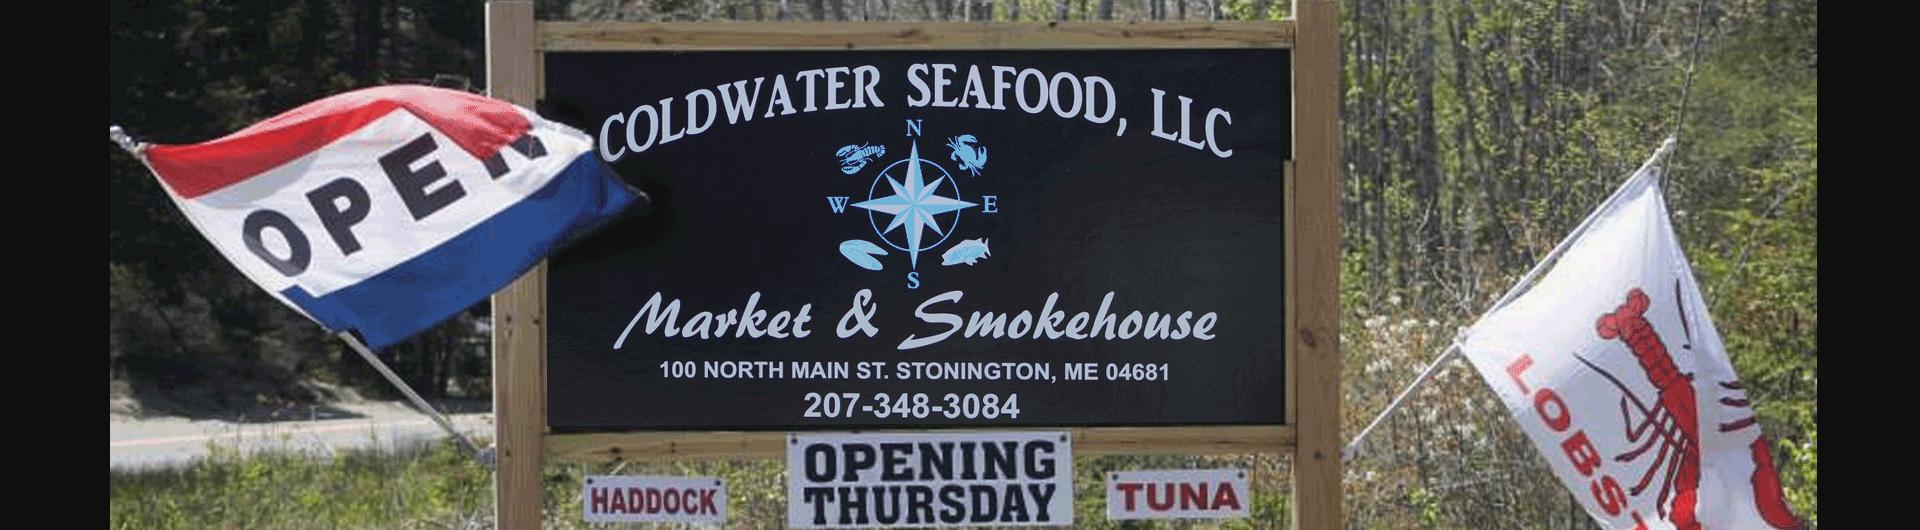 Coldwater Seafood Market & Smokehouse | Fresh Seafood